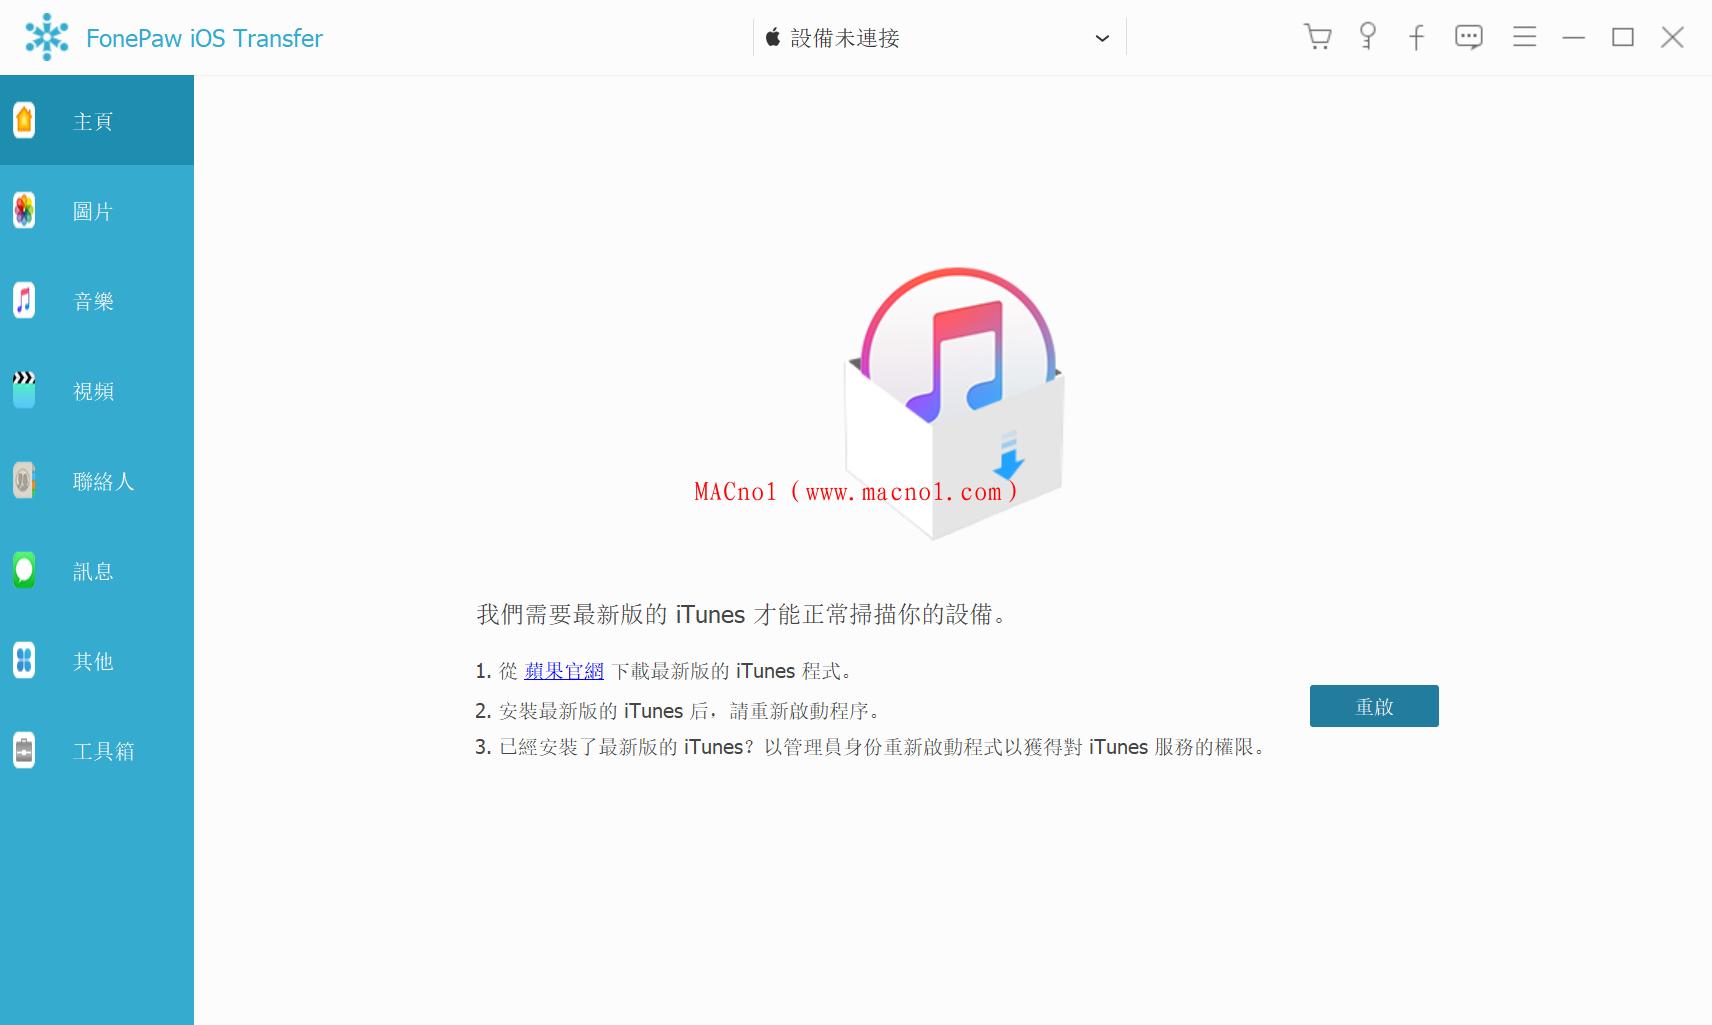 FonePaw iOS Transfer 3.png